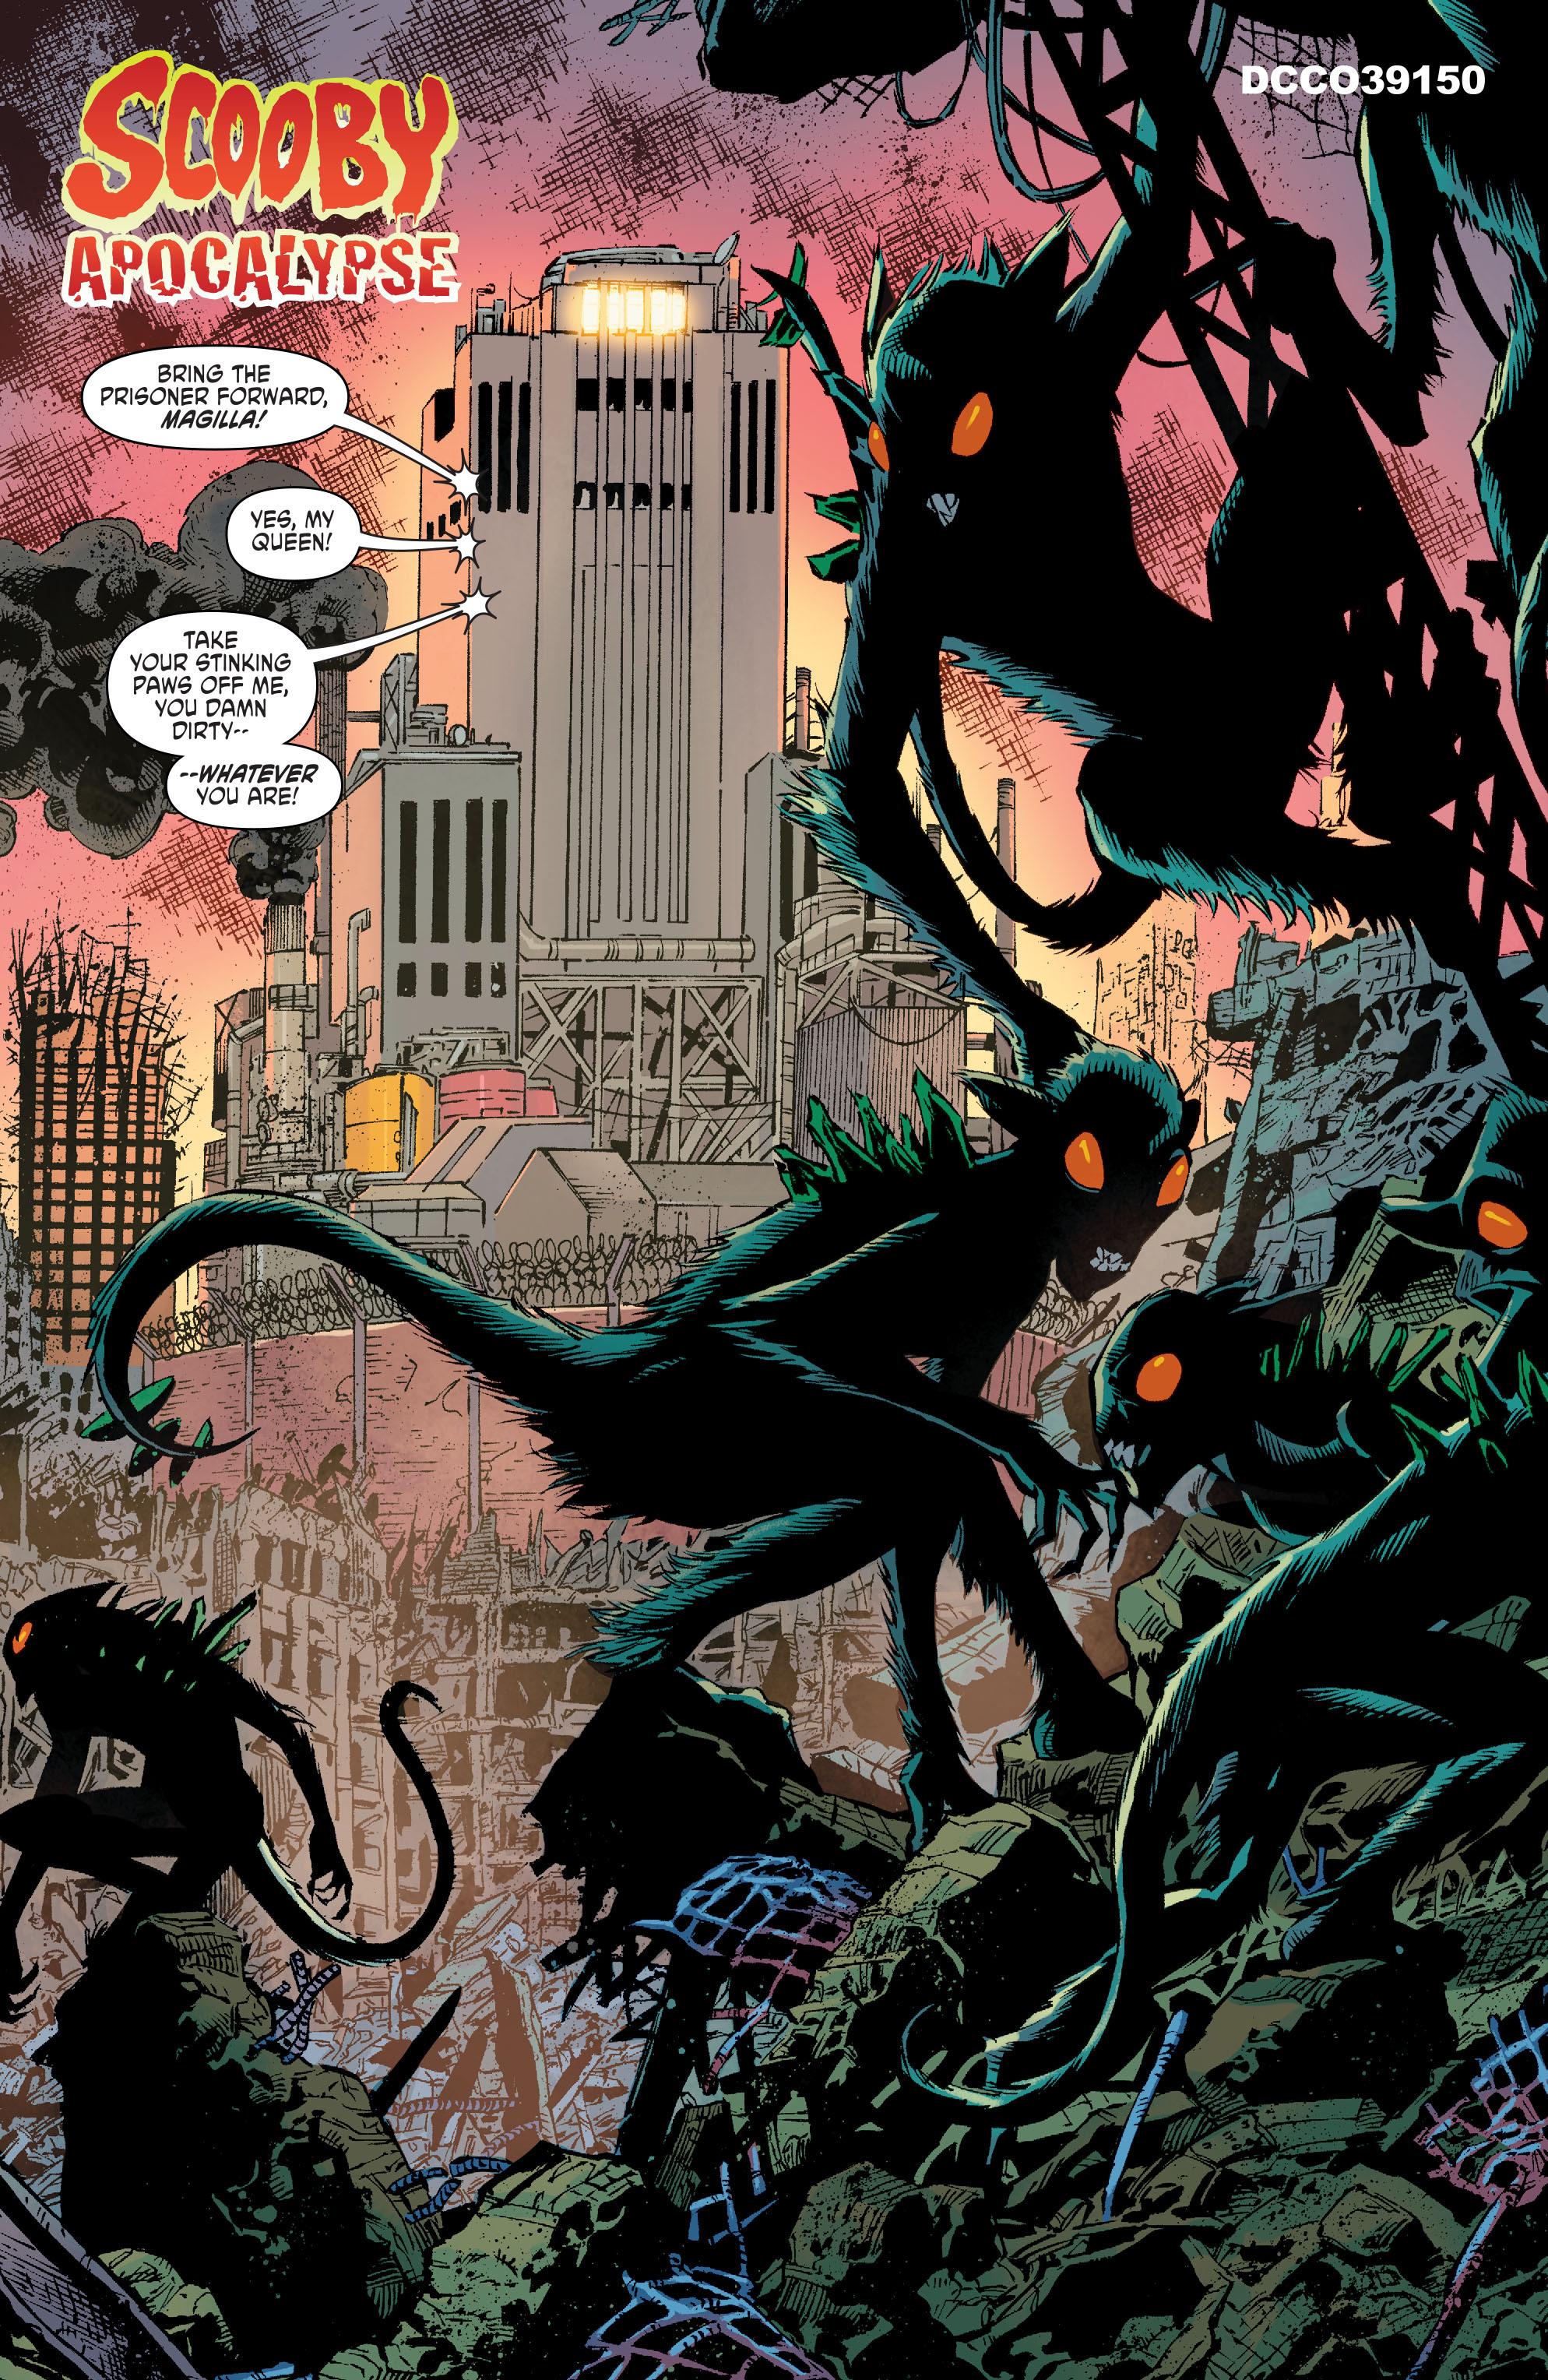 Read online Scooby Apocalypse comic -  Issue #10 - 4